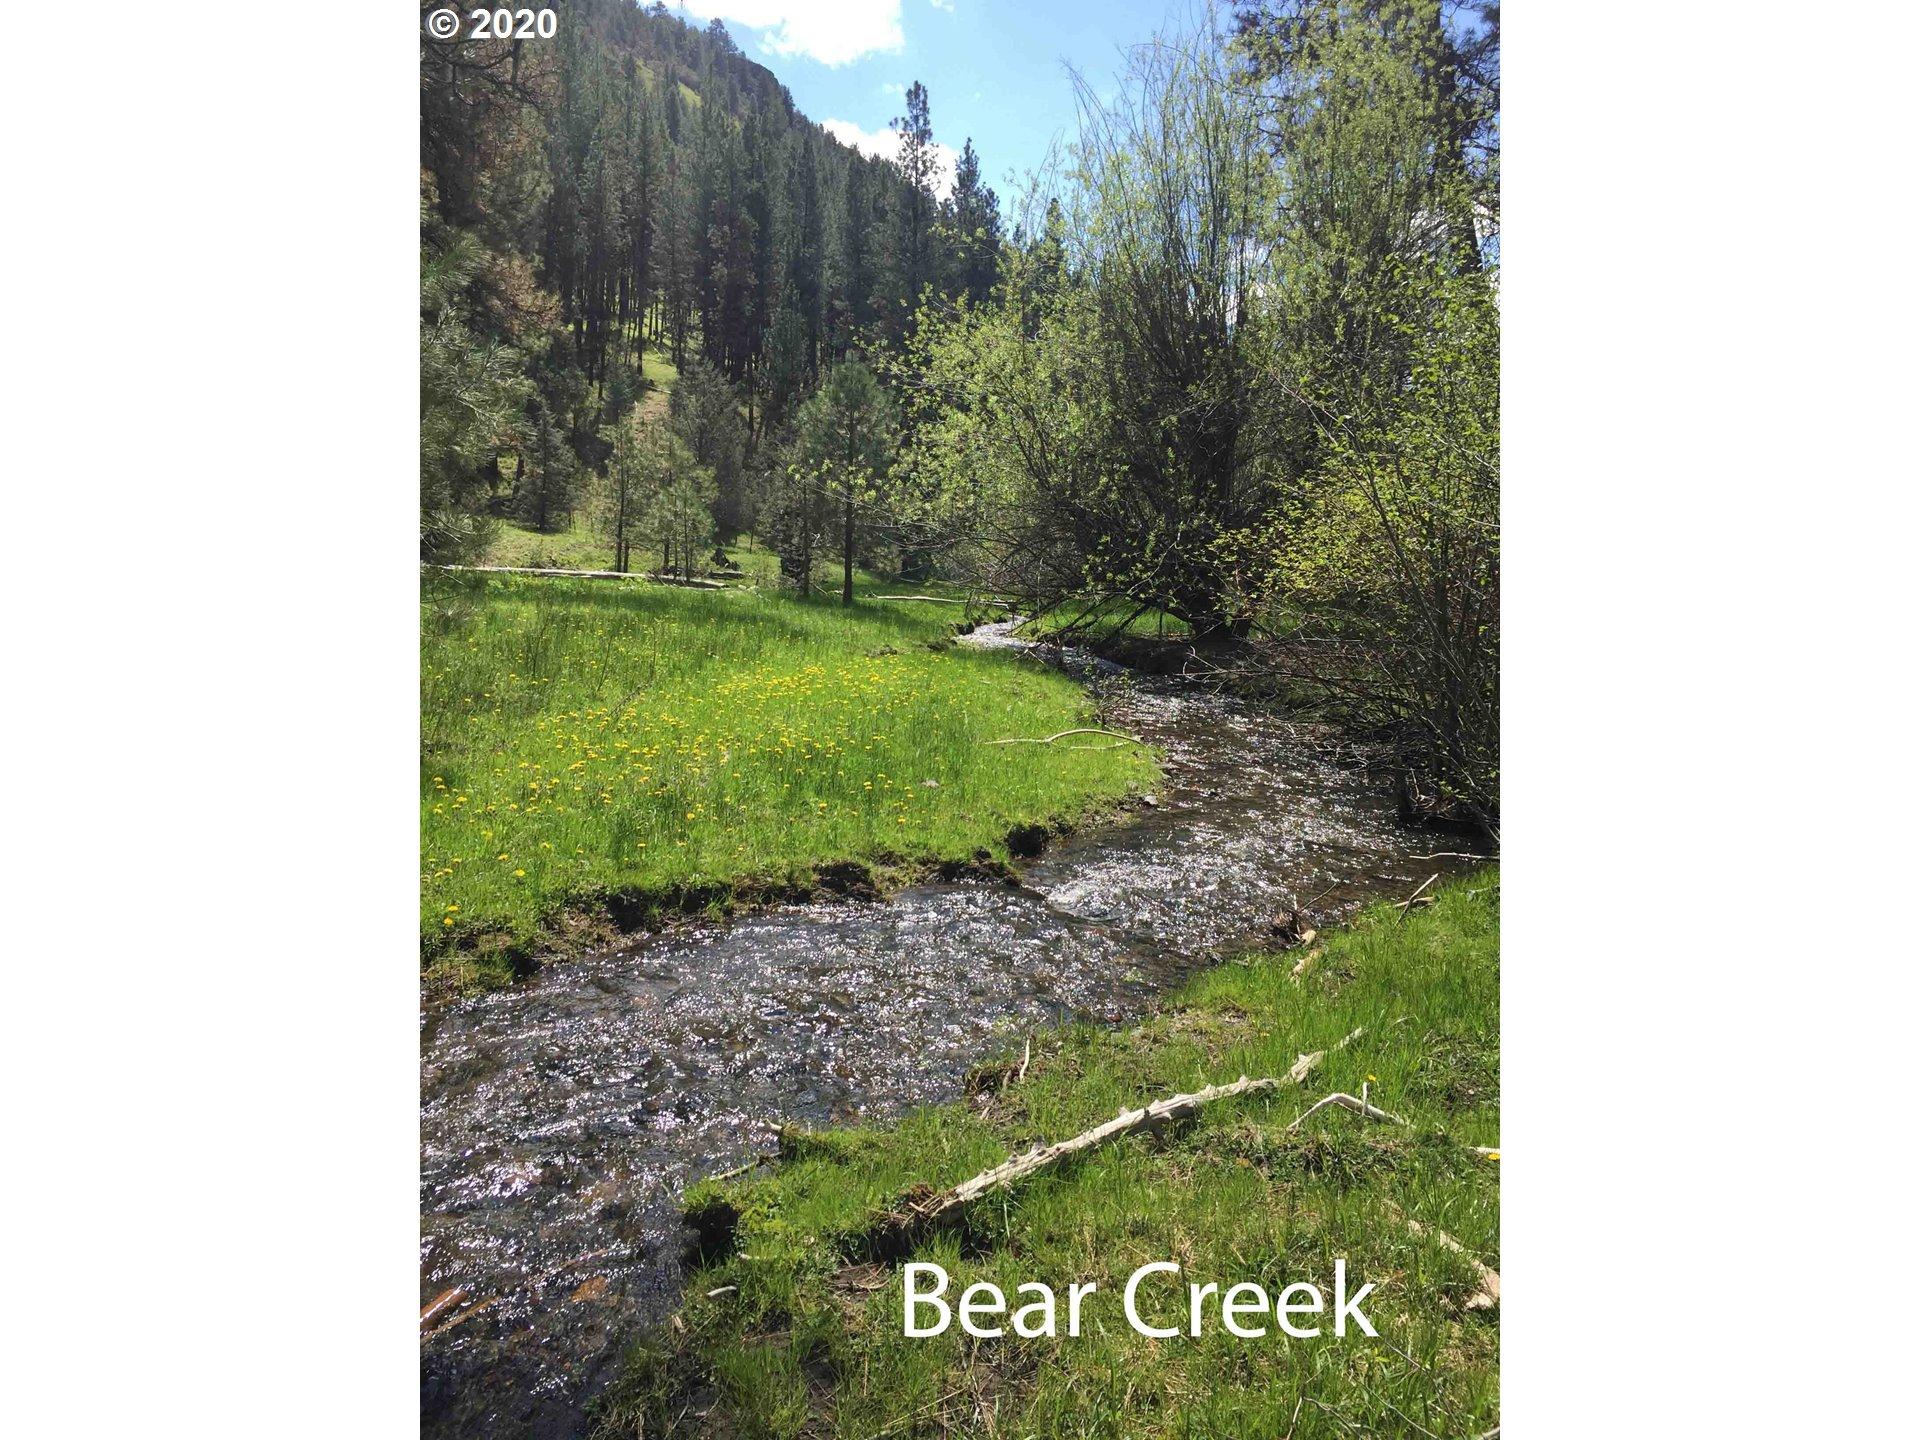 Photo of  Bear Creek Elk